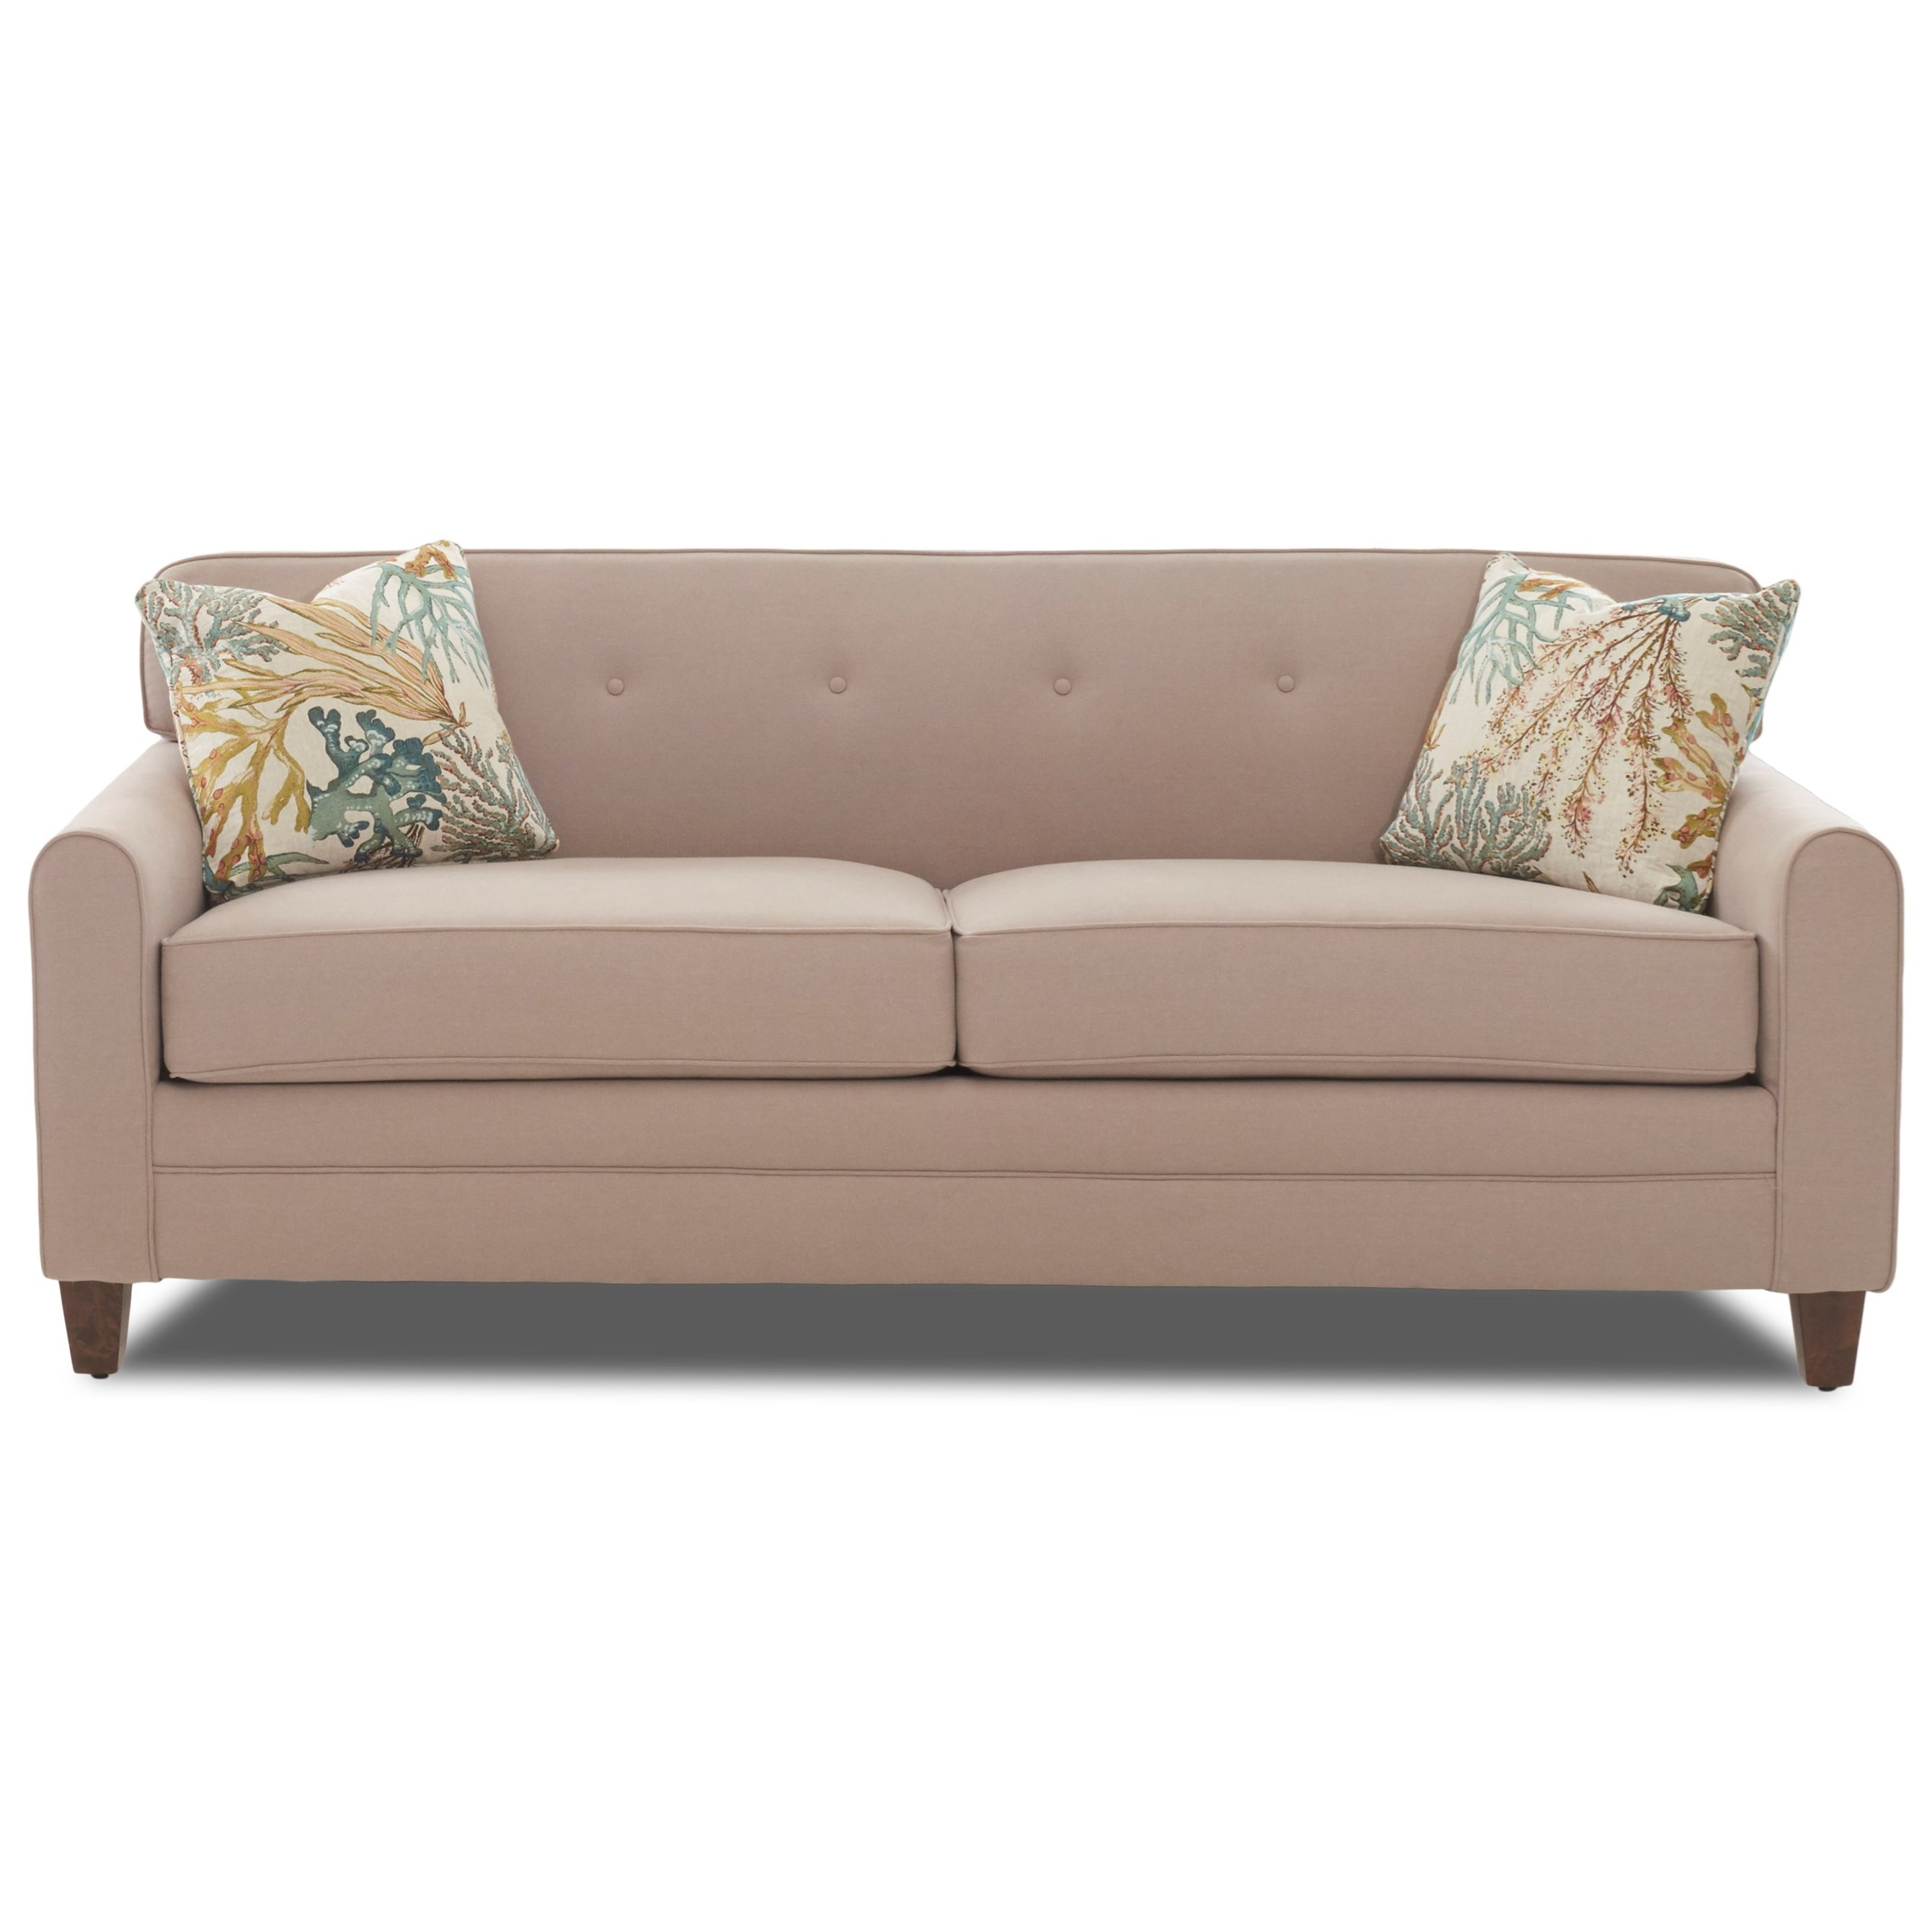 queen sleeper sofa memory foam mattress friheten corner bed skiftebo beige reviews klaussner peyton mid century modern with enso